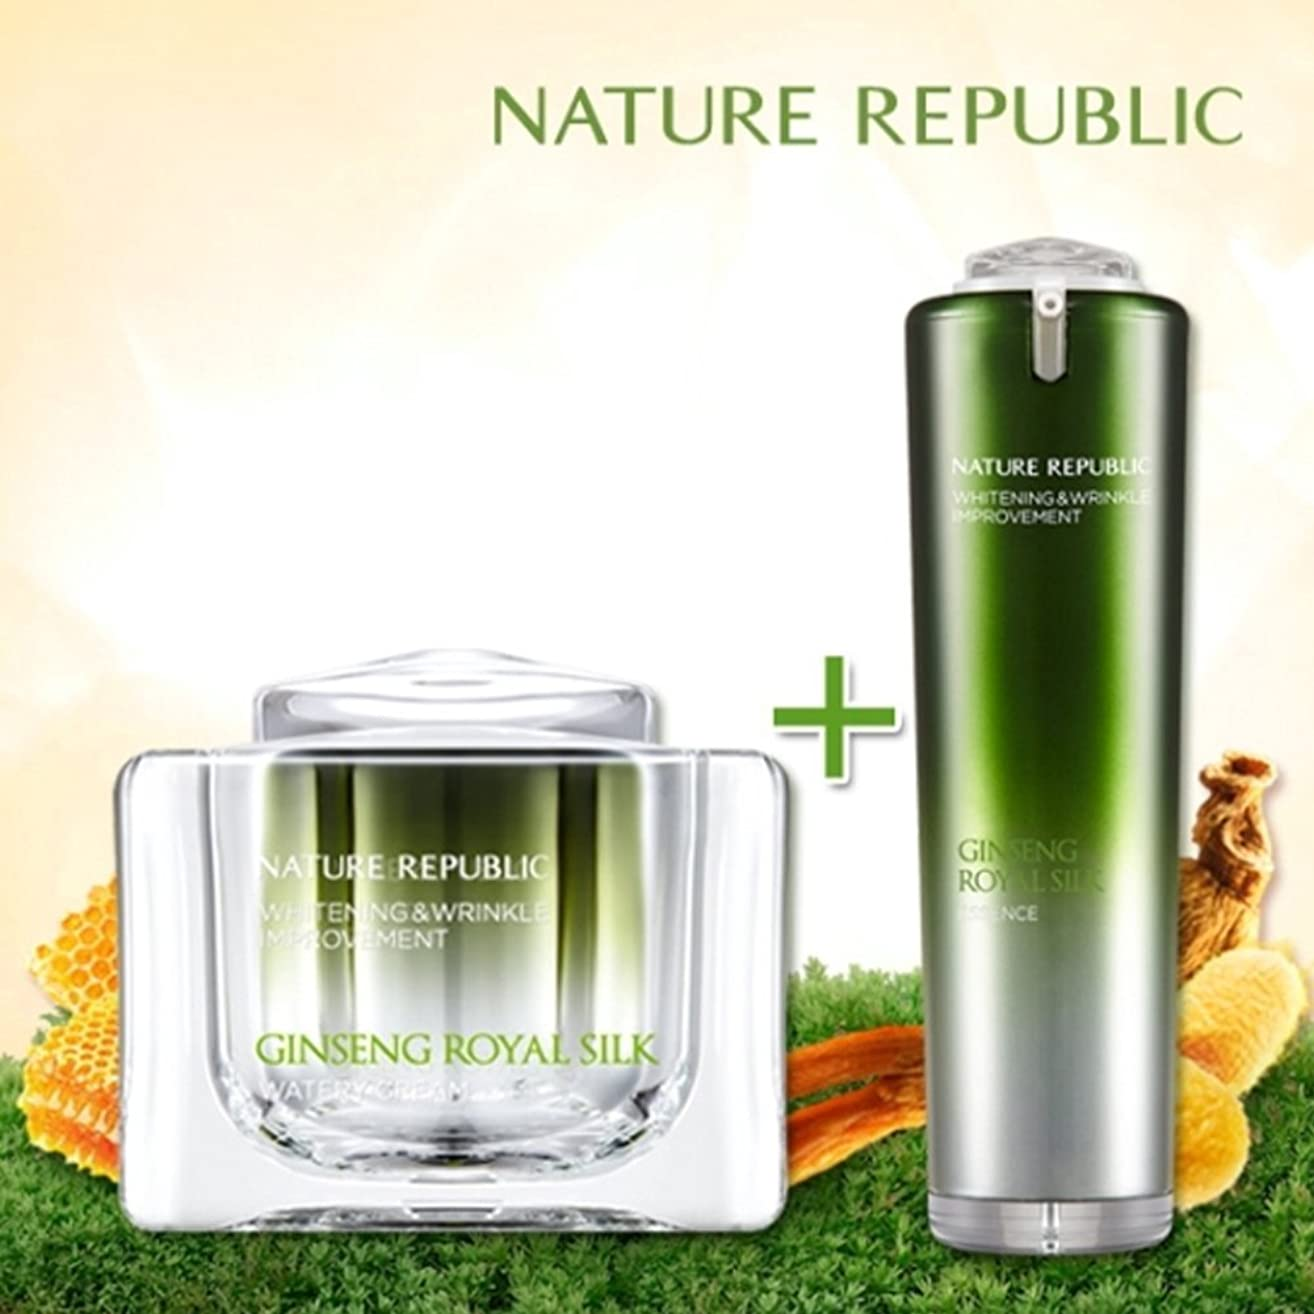 NATURE REPUBLIC/高麗人参ロイヤルシルクウォーターリークリーム+エッセンス Nature Republic、Ginseng Royal silk Watery Cream+Essence(海外直送品)